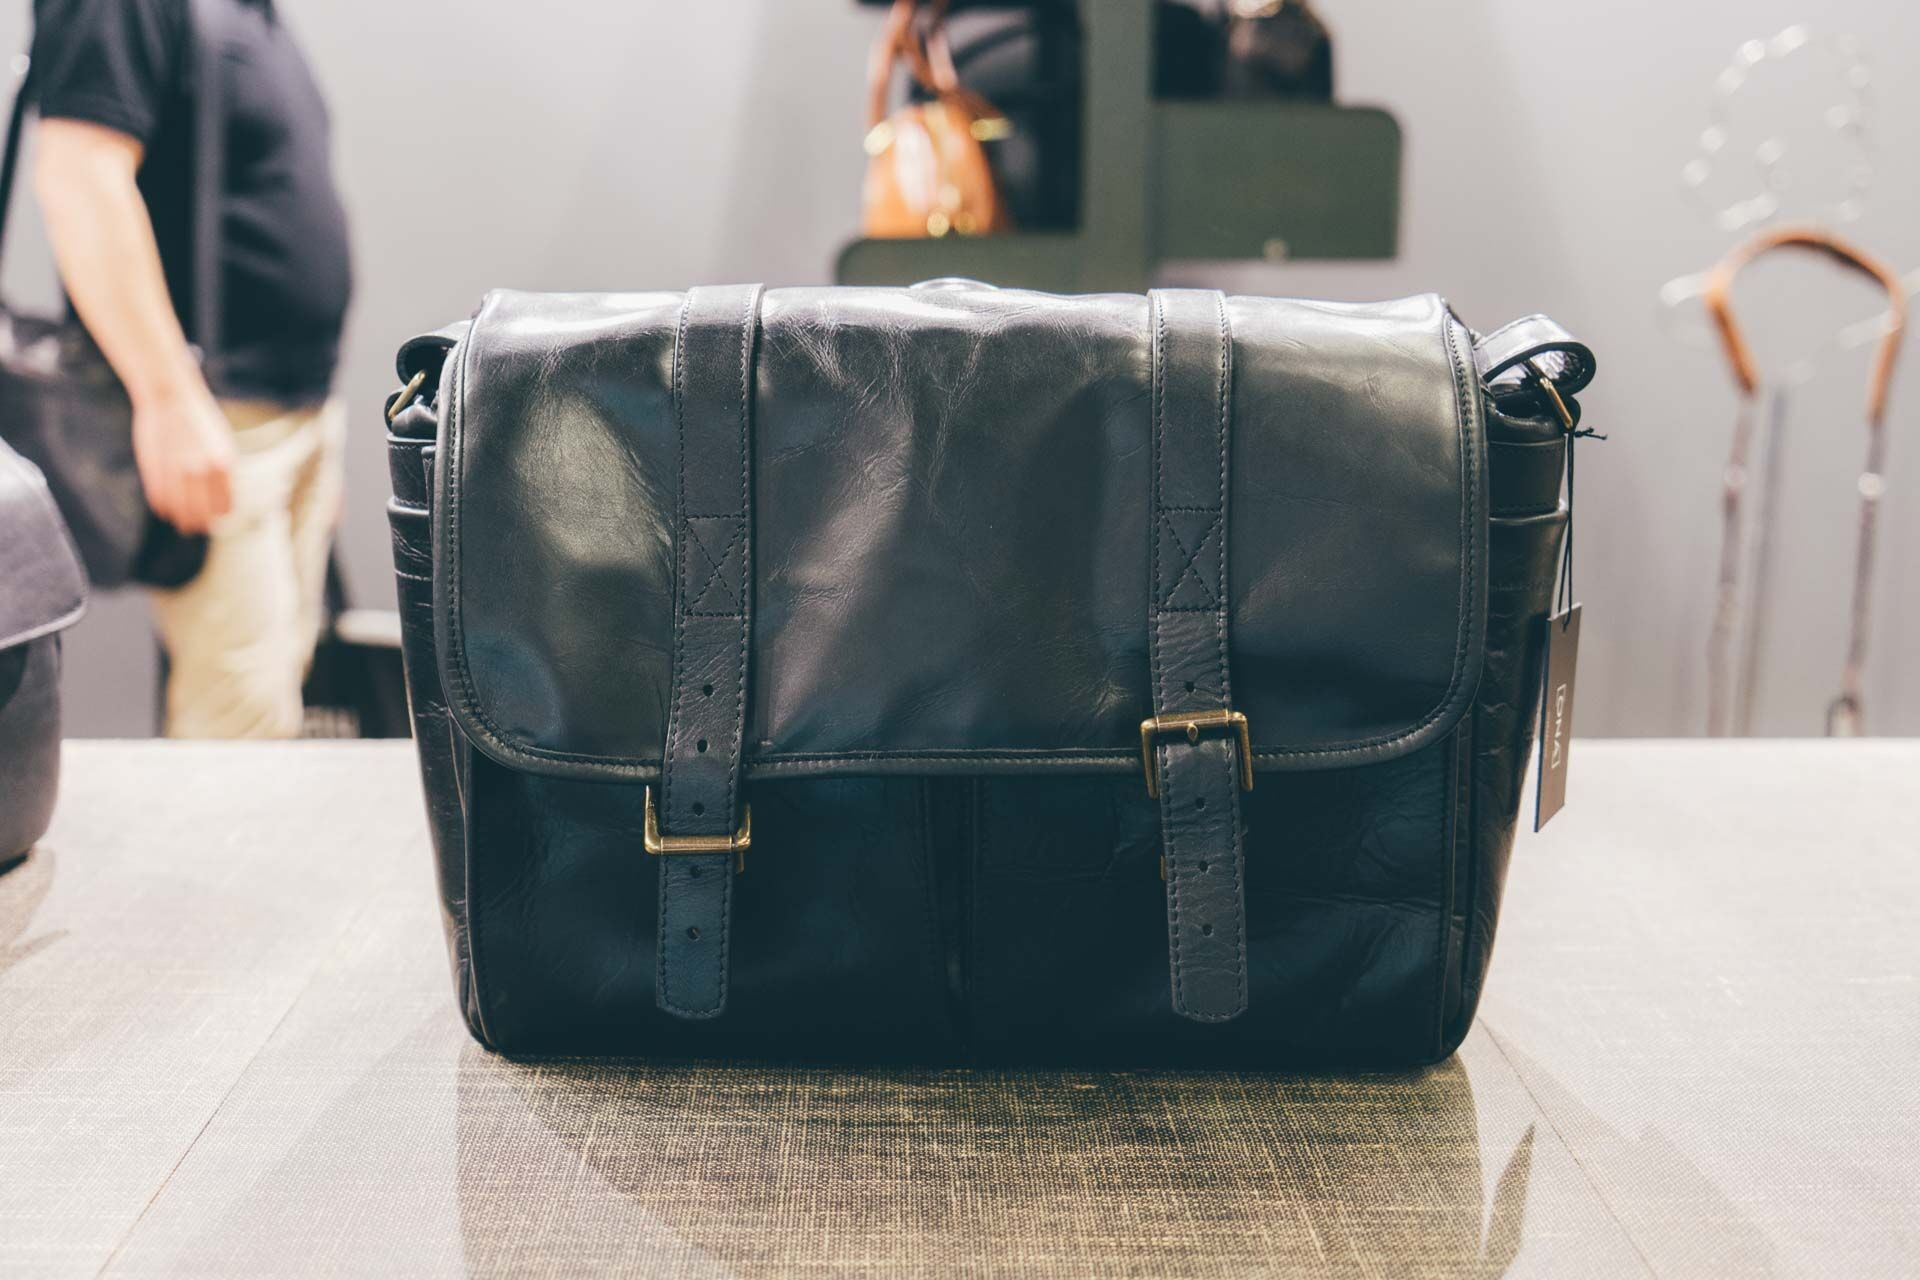 The all-new black [leather Brixton.](https://www.amazon.com/ONA-Brixton-Camera-Messenger-Leather/dp/B01LQV1D16/?tag=toolsandtoys-20)